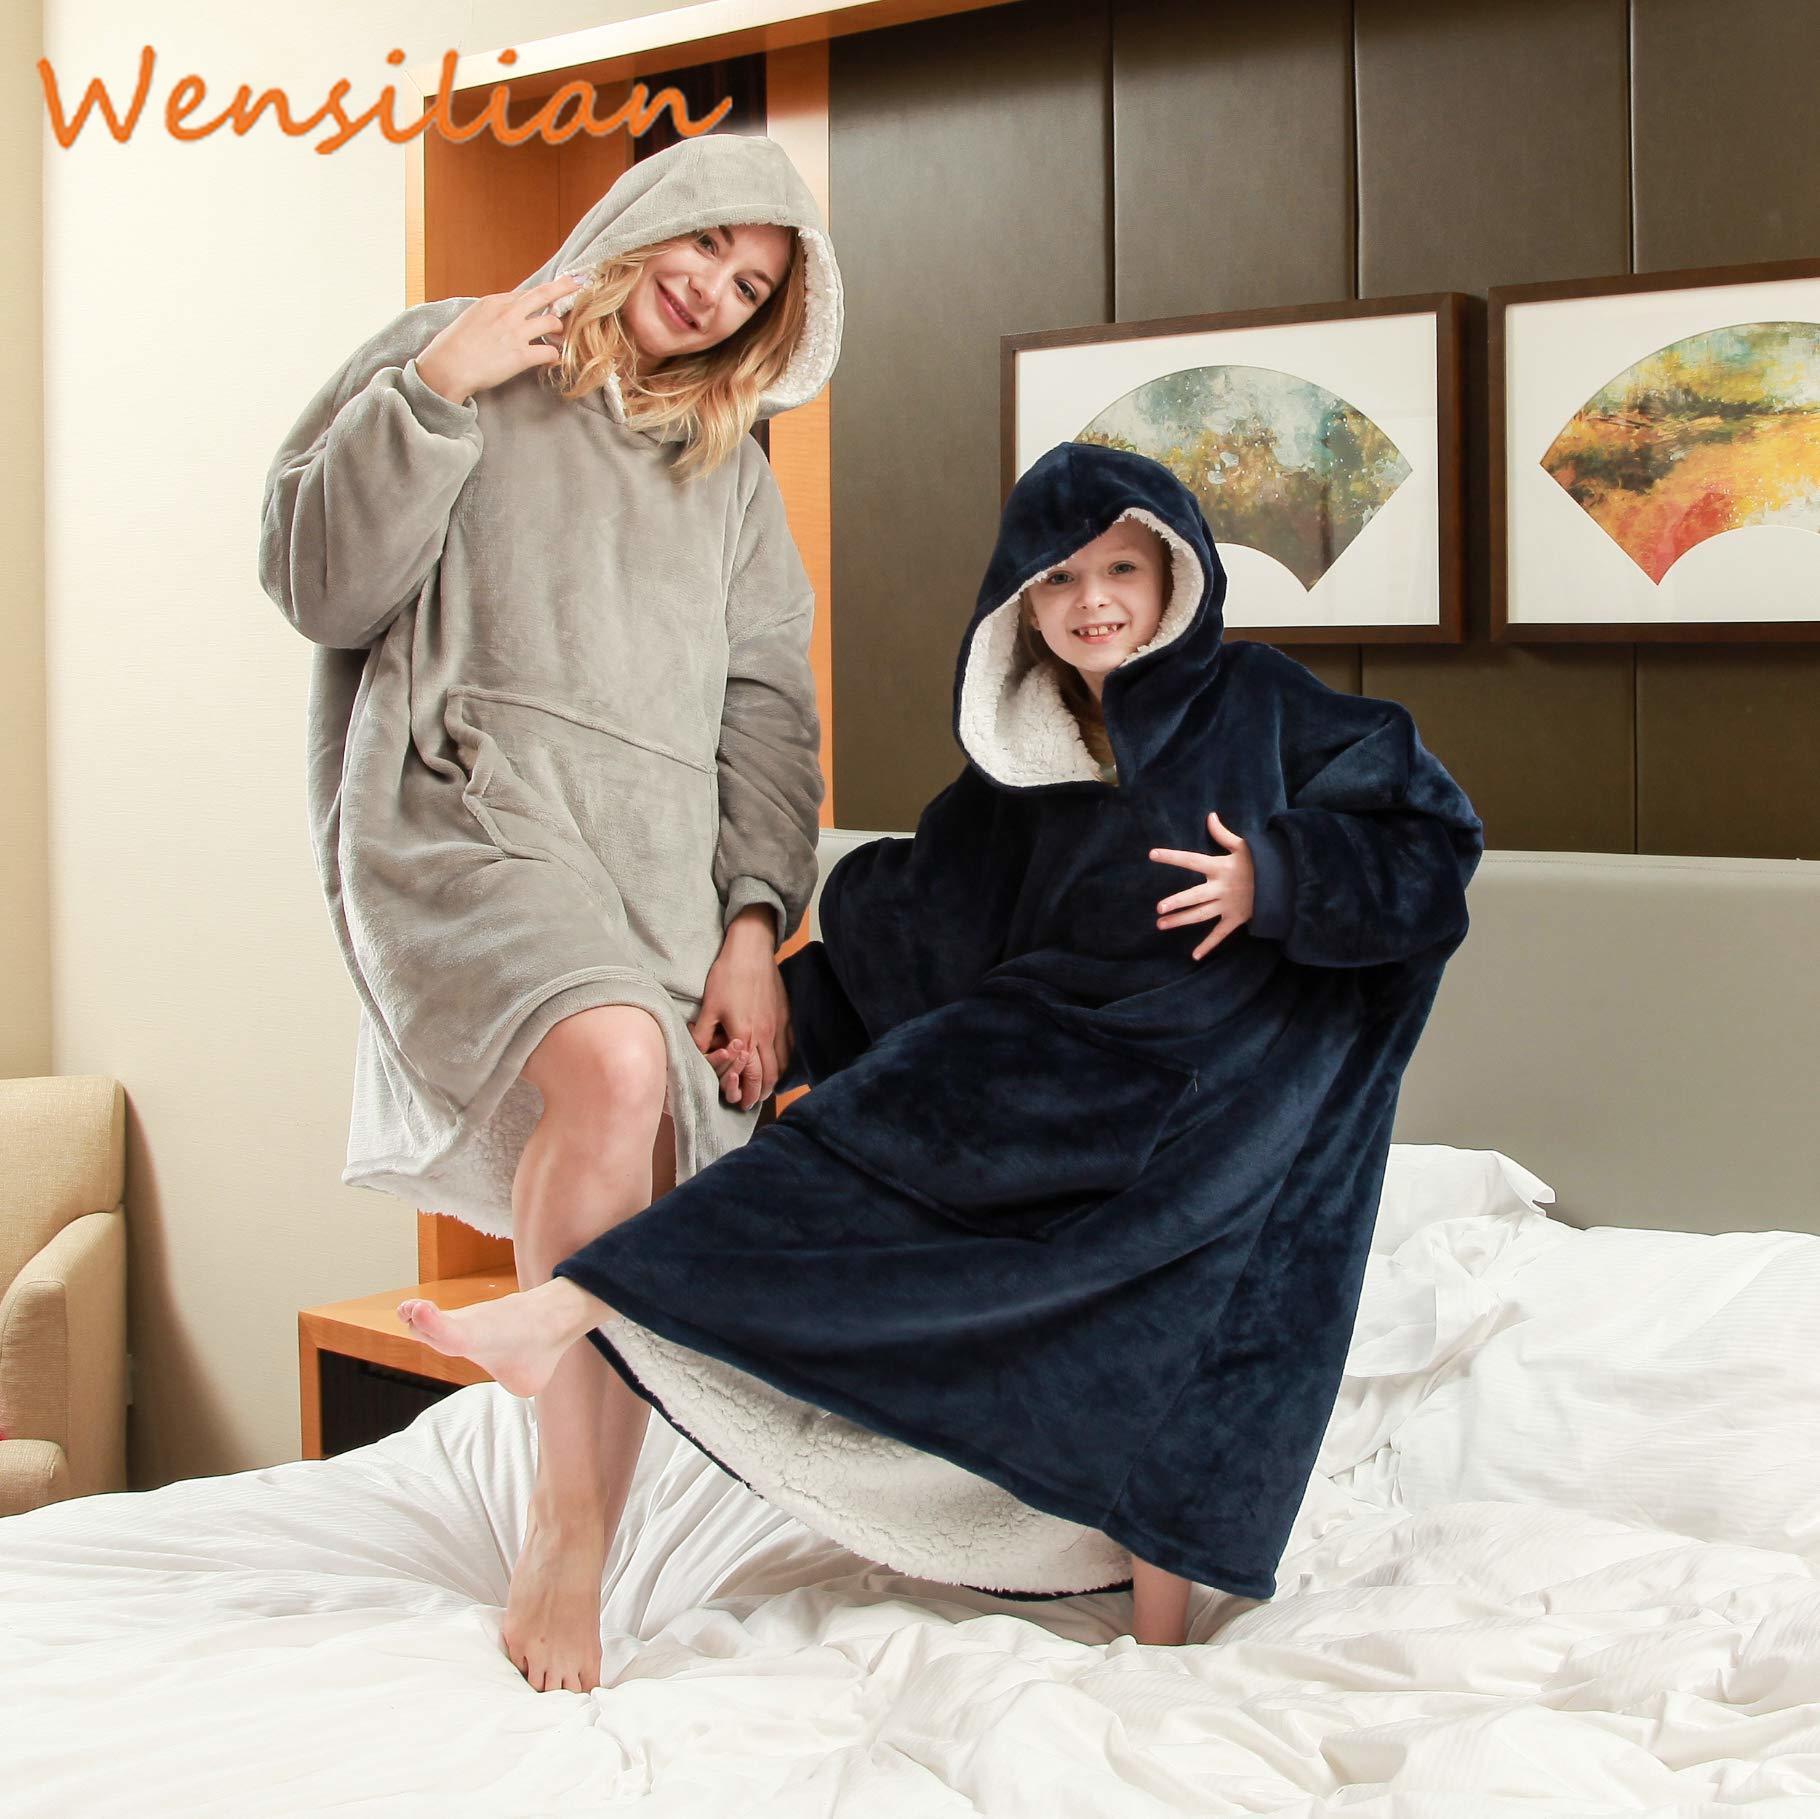 Oversized Sweatshirt Women's Hoodie TV Blanket With Sleeve Plaid Giant Hoodies Sudadera Mujer Fleece Oversize Bluza Damska